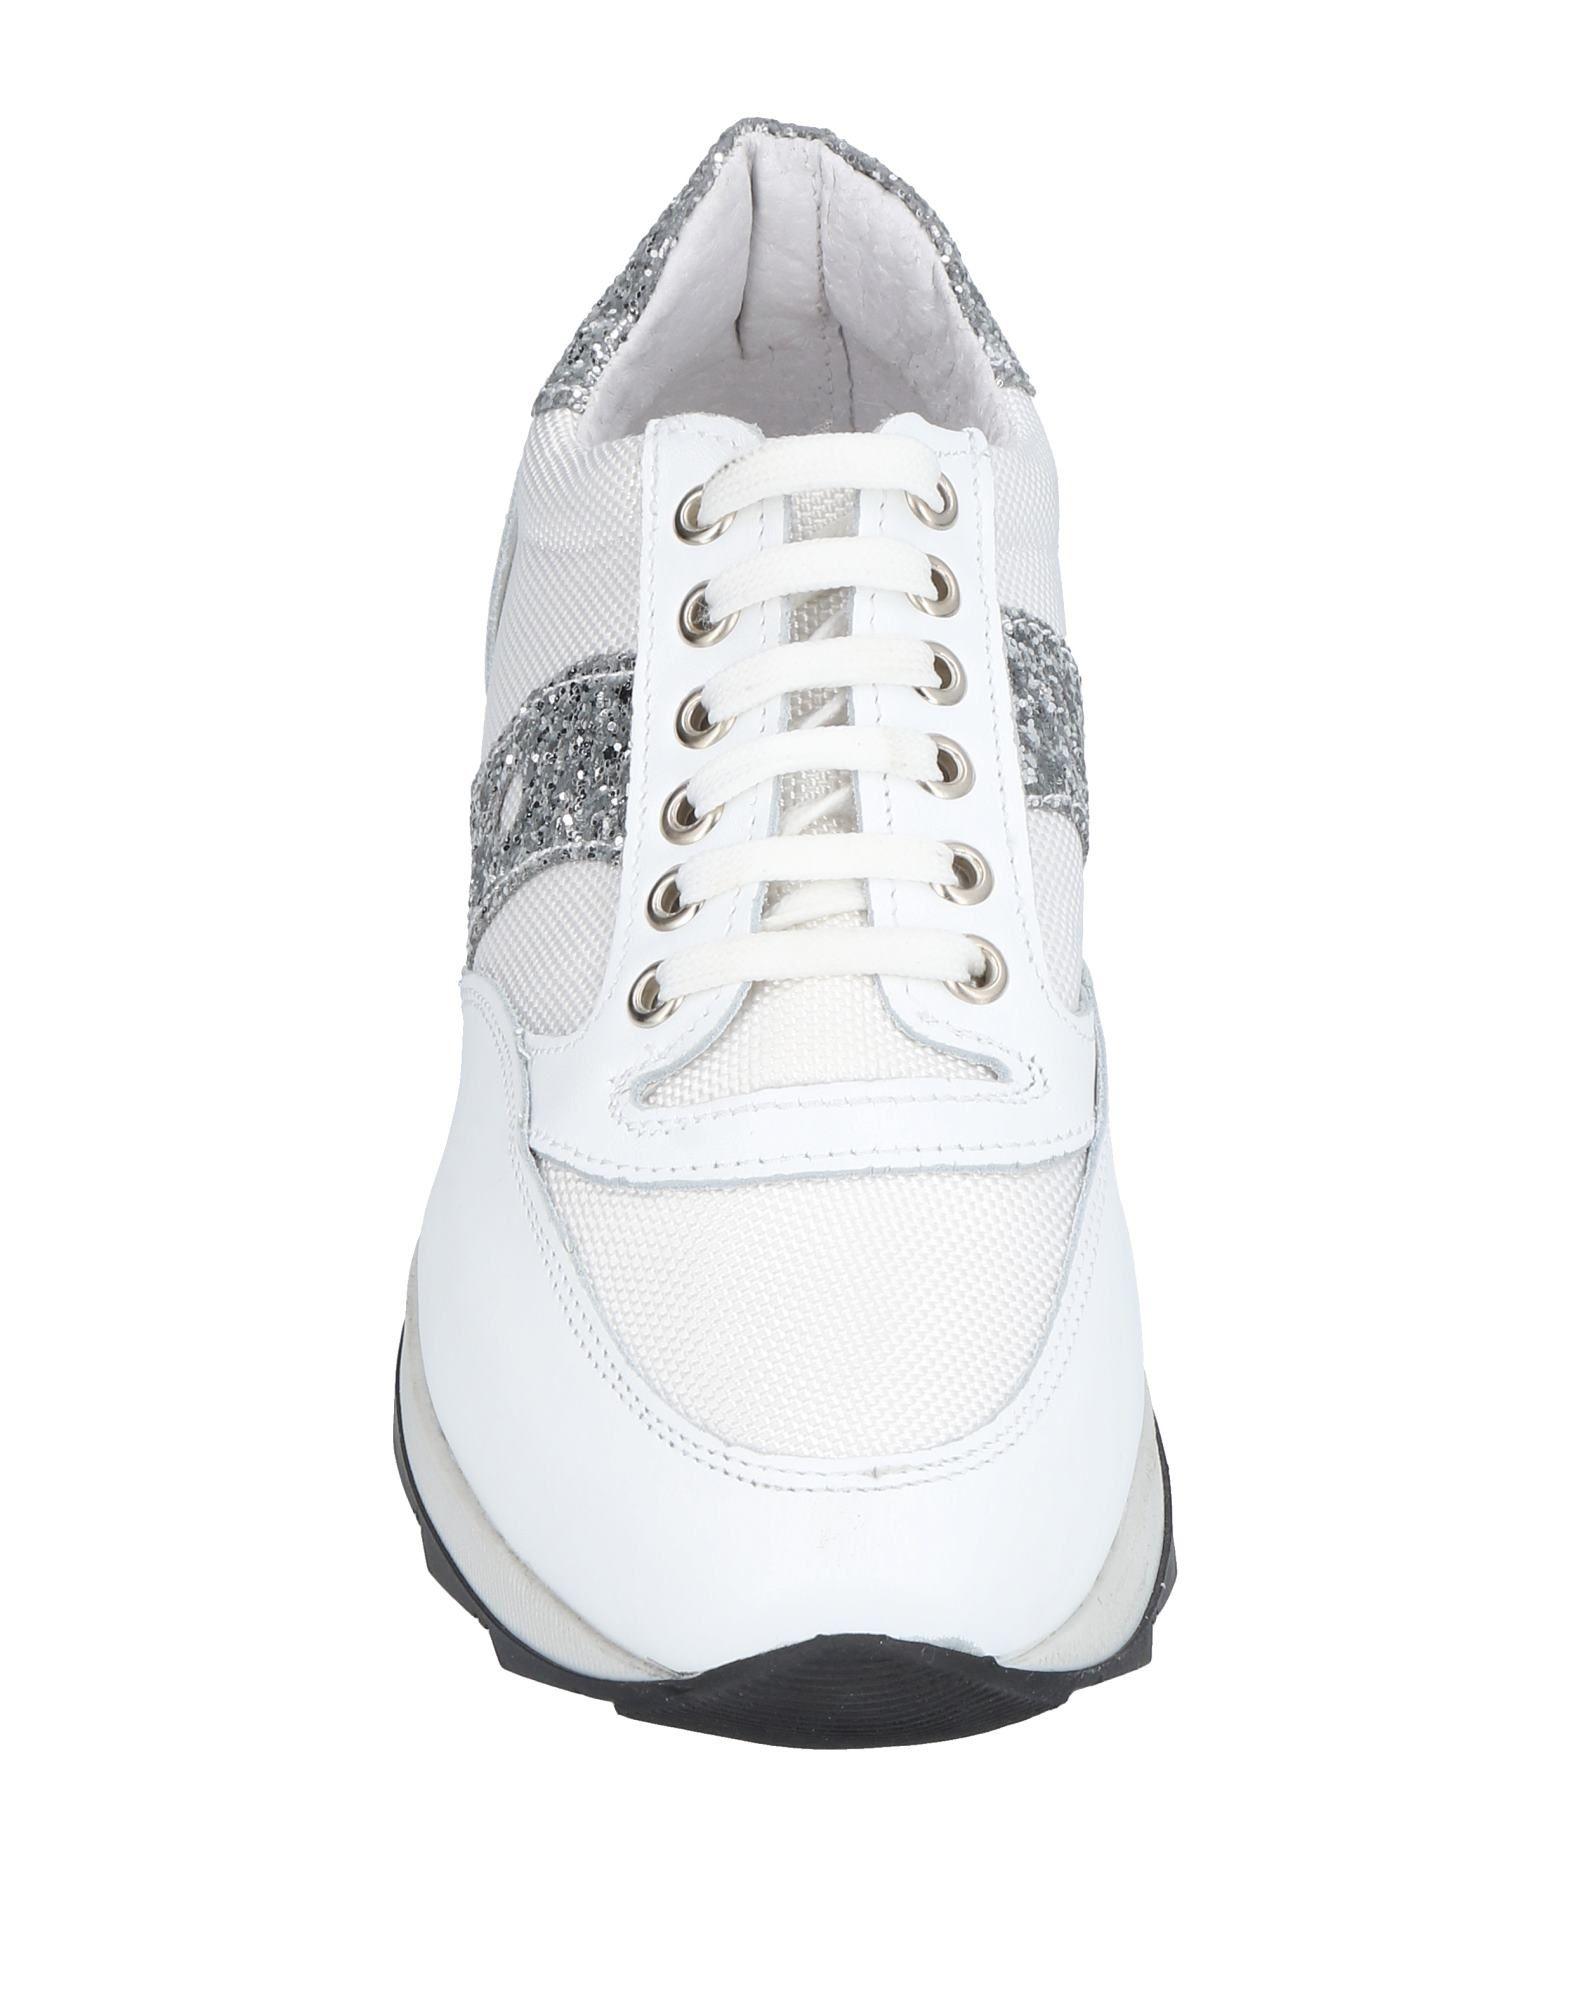 Roberto Della Croce Sneakers Damen  11461590FR Gute Qualität beliebte Schuhe